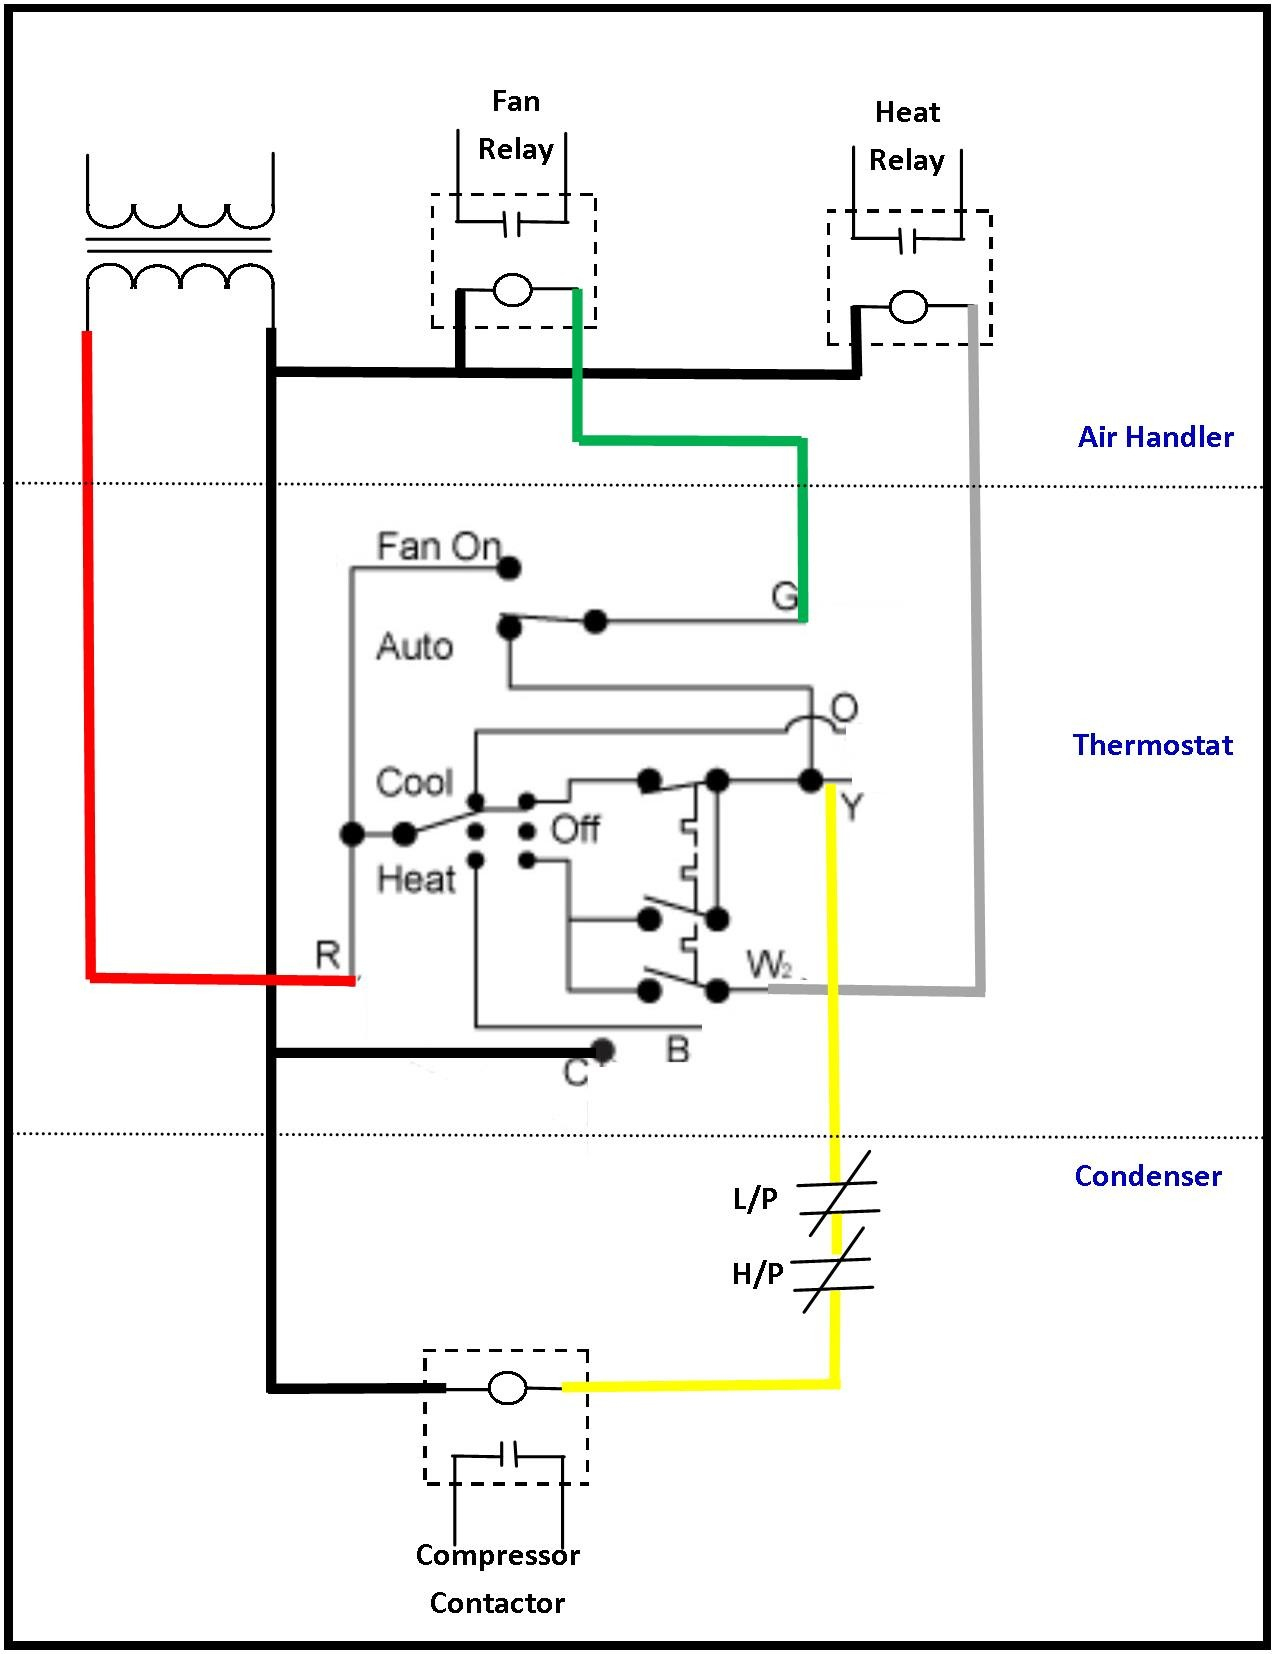 480V Hvac Transformer Wiring Diagram | Wiring Diagram - 480V To 120V Transformer Wiring Diagram